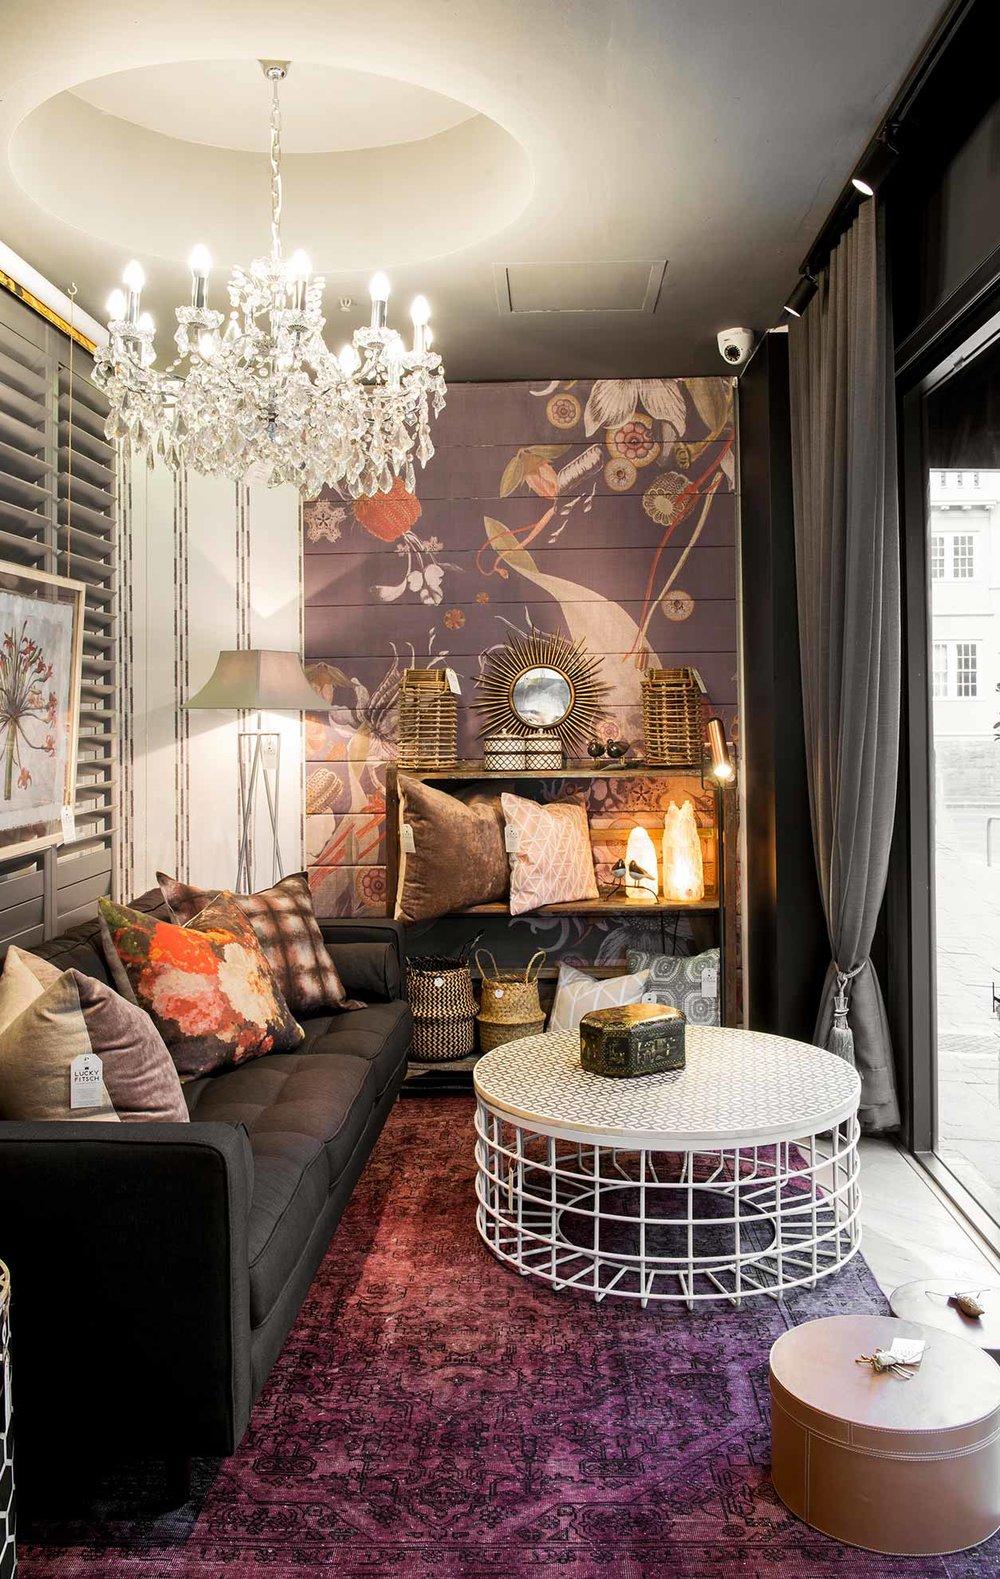 Lucky-fitsch-store-livingroom-art.jpg